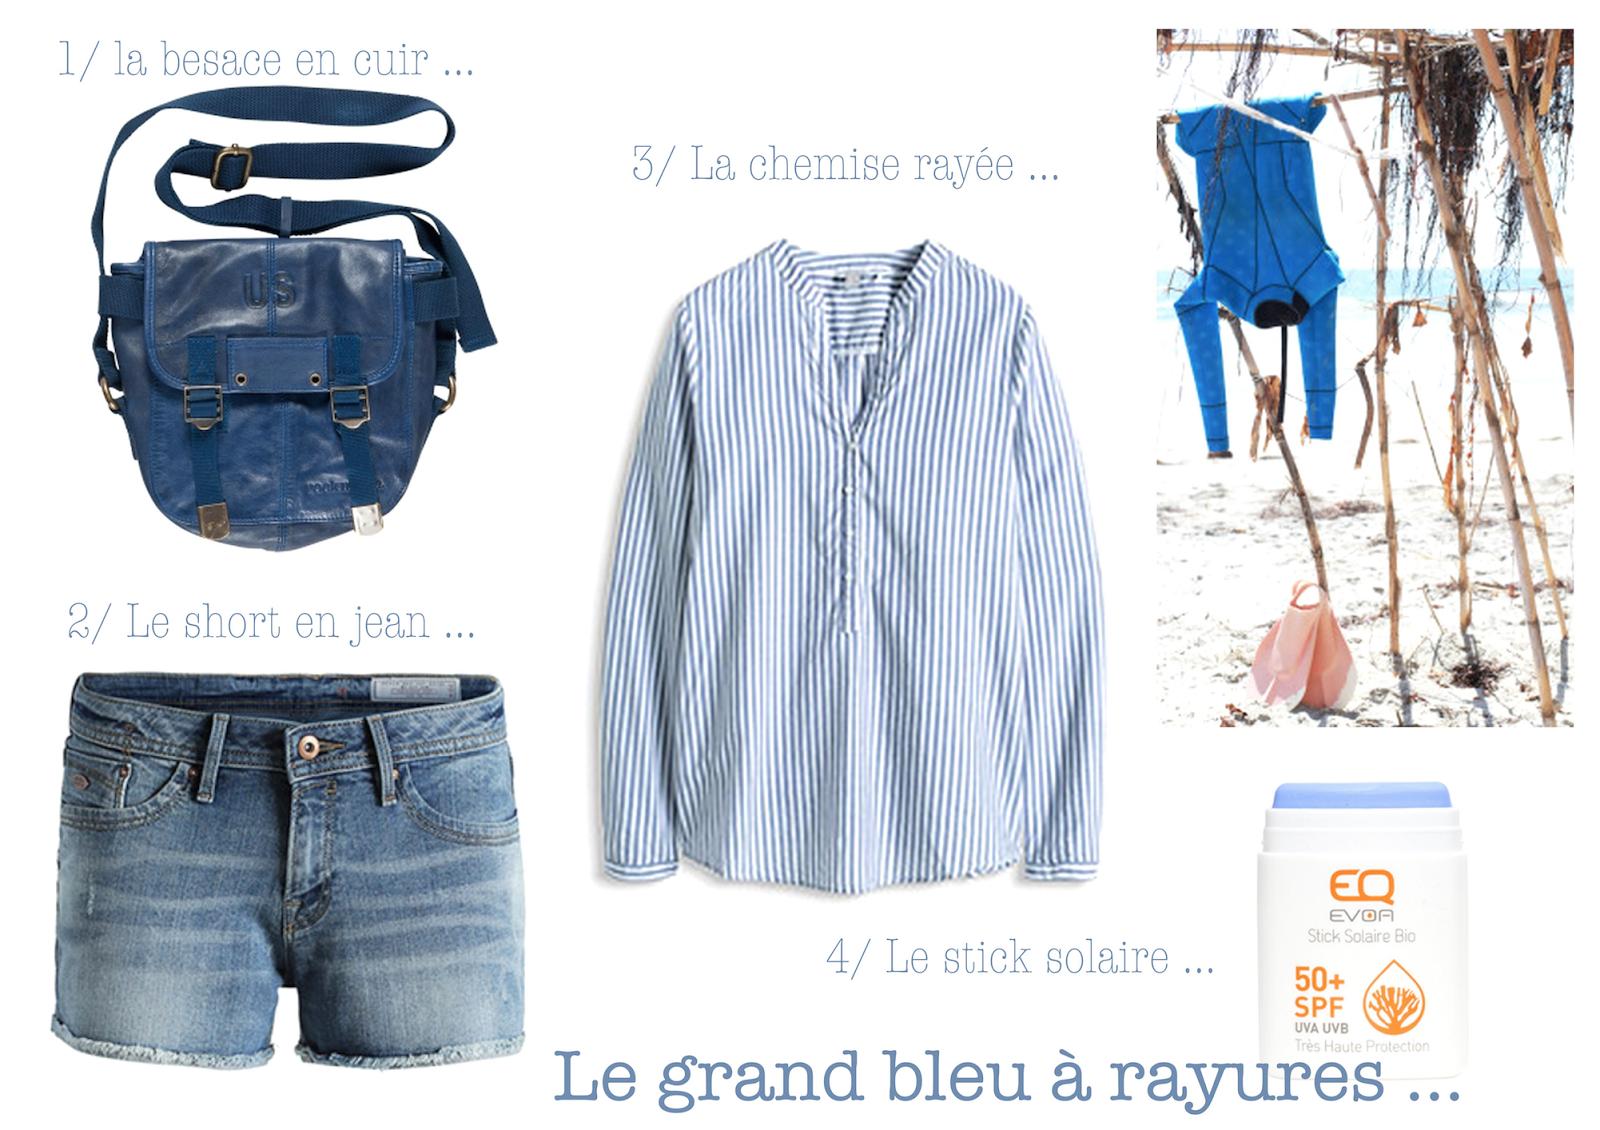 esprit,rayures,blanc,bleu,rockmafia,besace US,cuir,eqlove,short en jeans